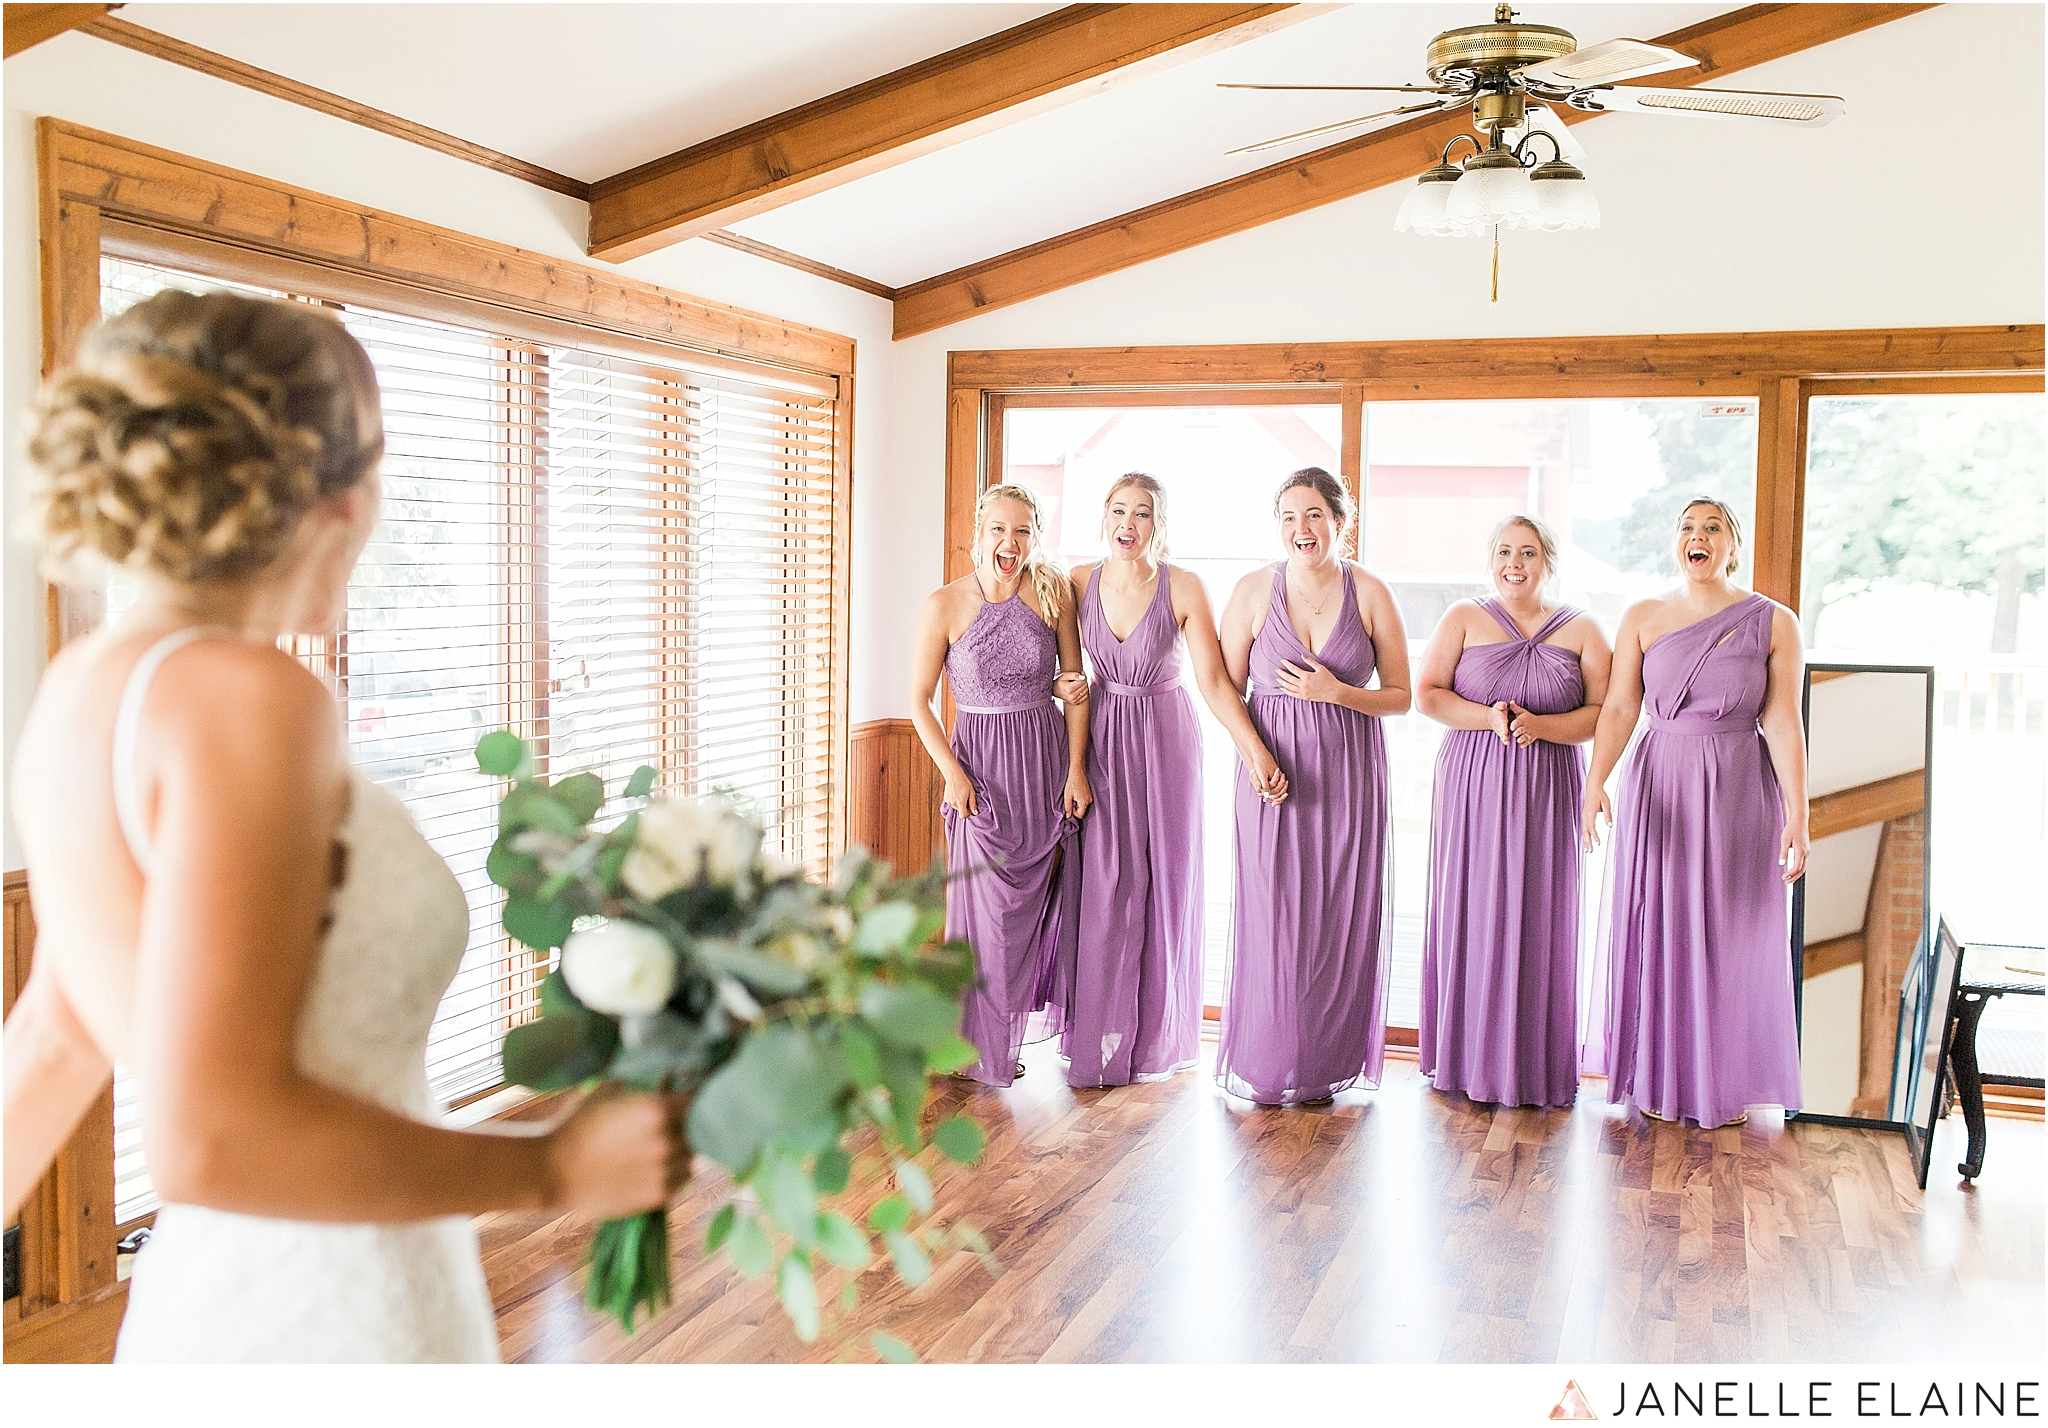 warnsholz-wedding-michigan-photography-janelle elaine photography-41.jpg